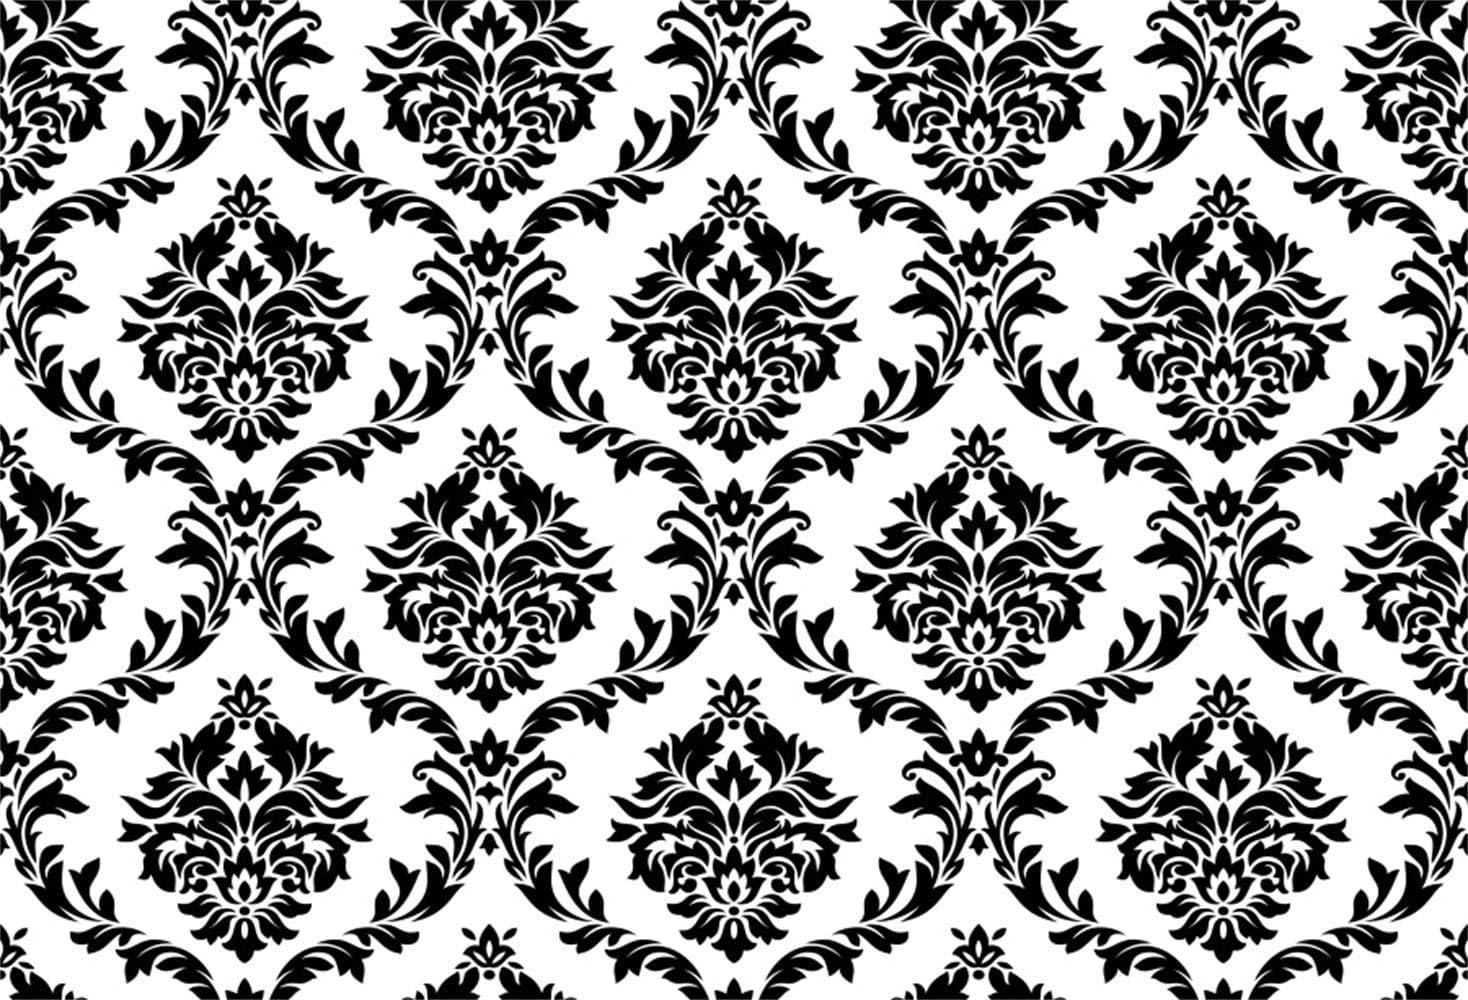 Vintage White Black Damask Wall 10x8ft Vinyl Photography Background Plain Style Personal Artistic Portrait Wedding Shoot Backdrop Indoor Decors Wallpaper Studio Props Nostalgia